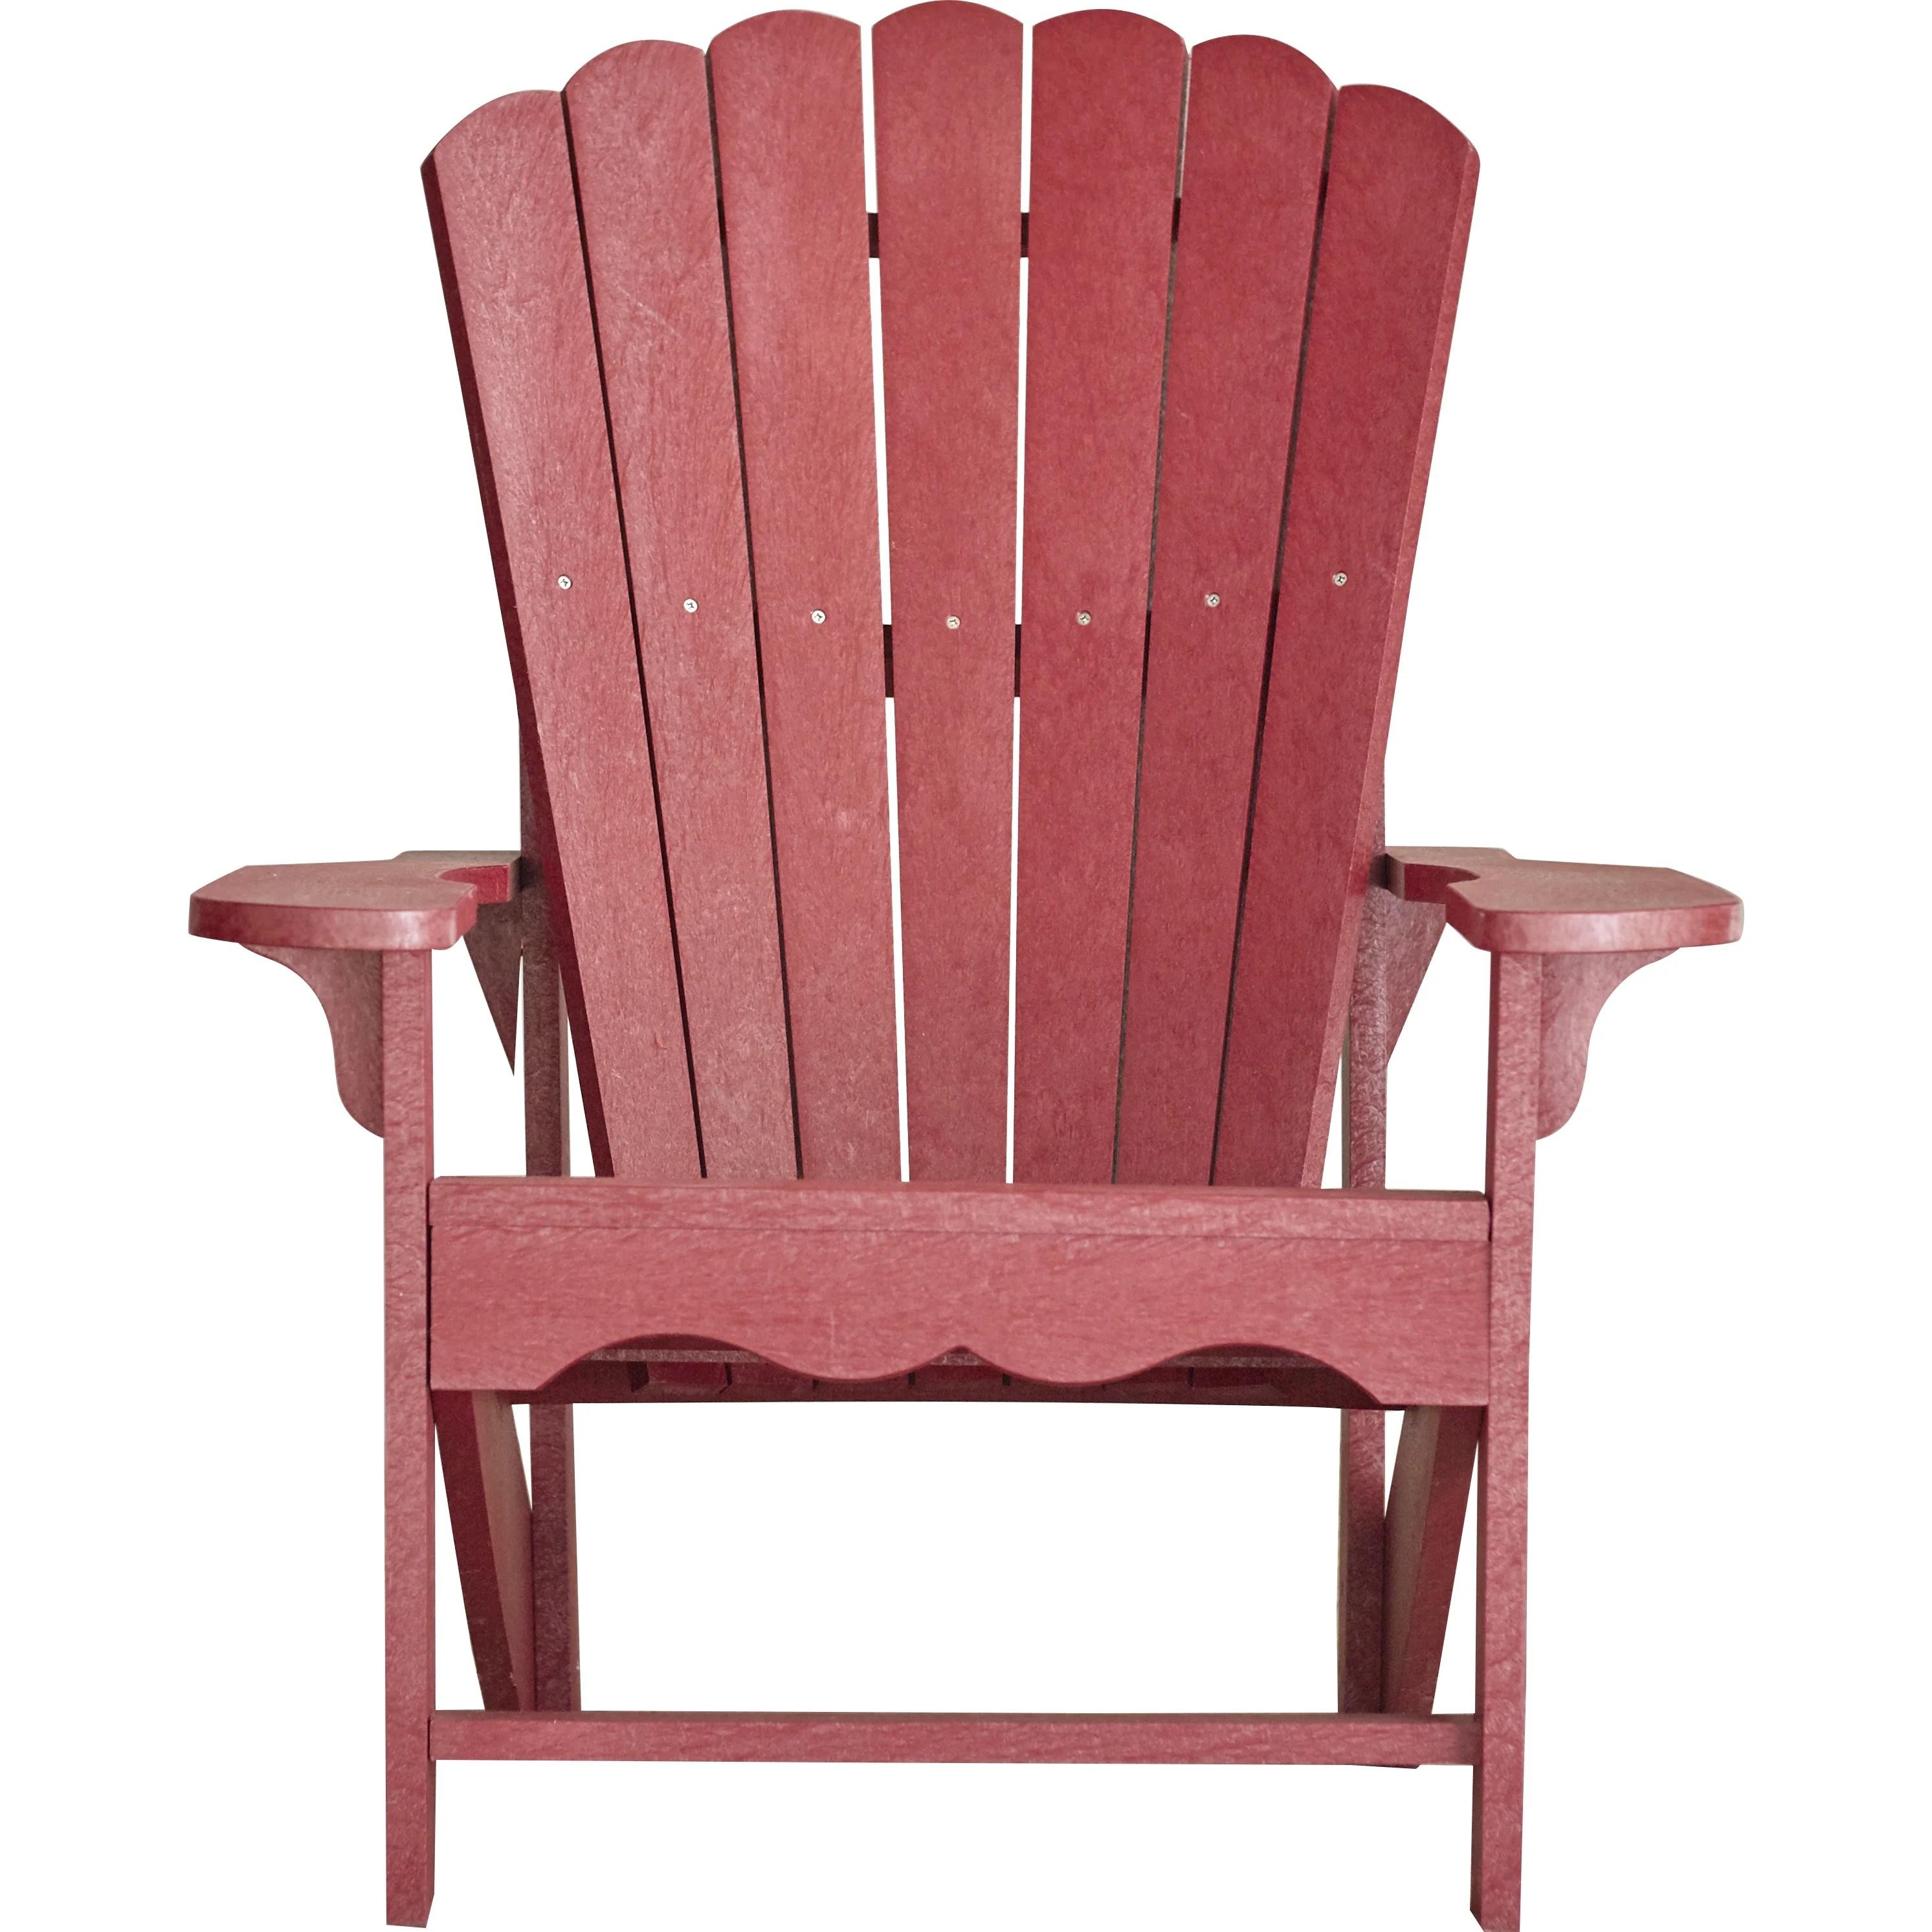 wayfair adirondack chairs rocking chair cushion set canada bay isle home aloa and reviews